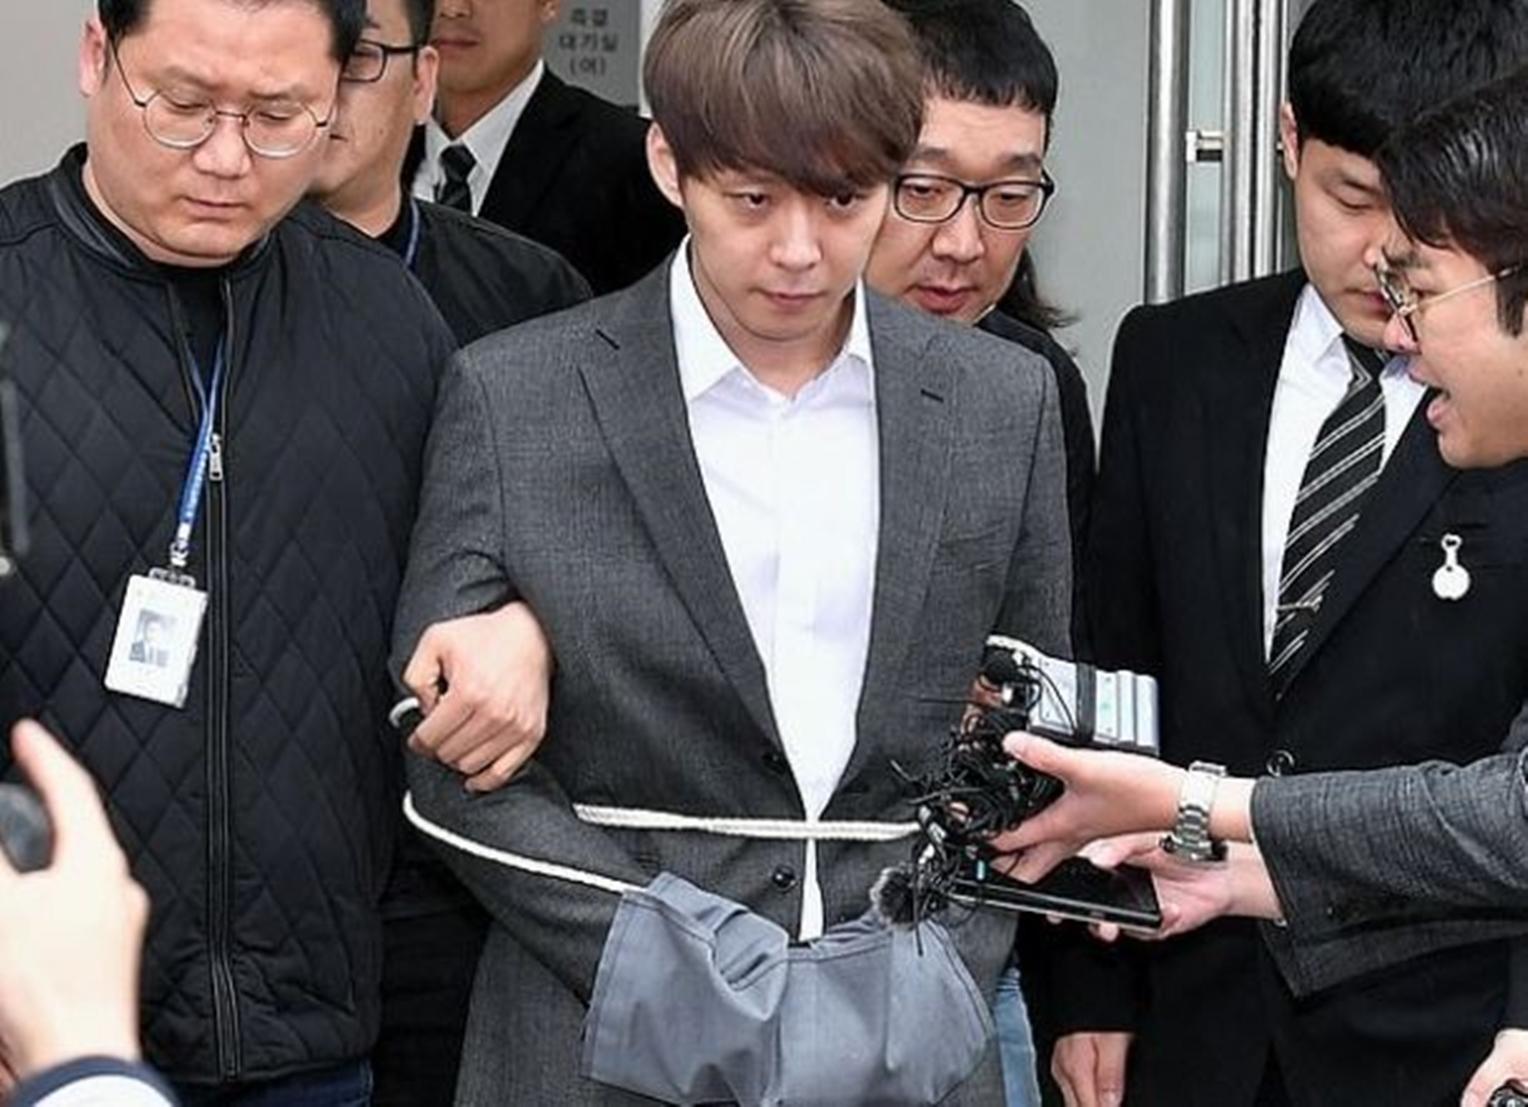 Telah Ditetapkan Tanggal Sidang Pertama Park Yoo Chun Mengenai Kasus Narkoba 4